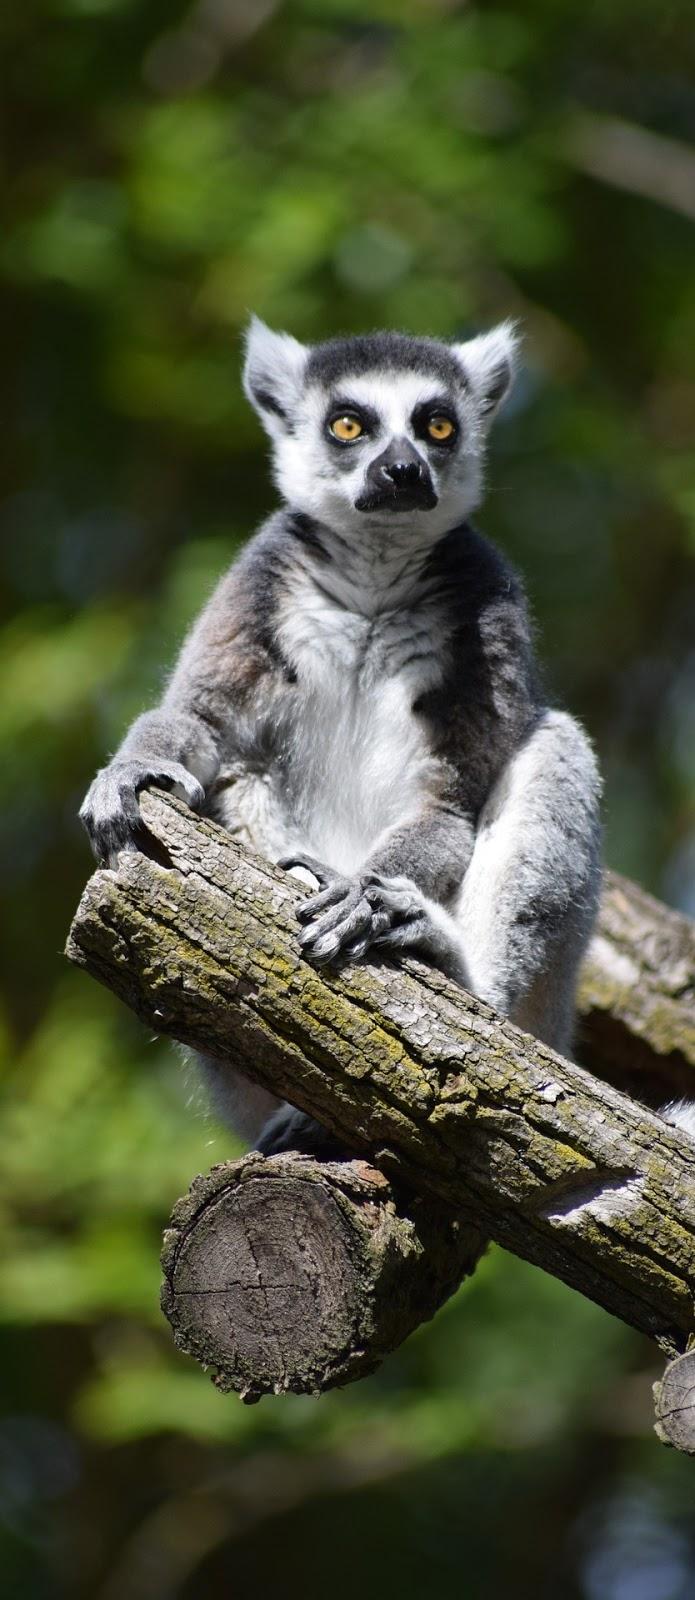 A cute lemur.